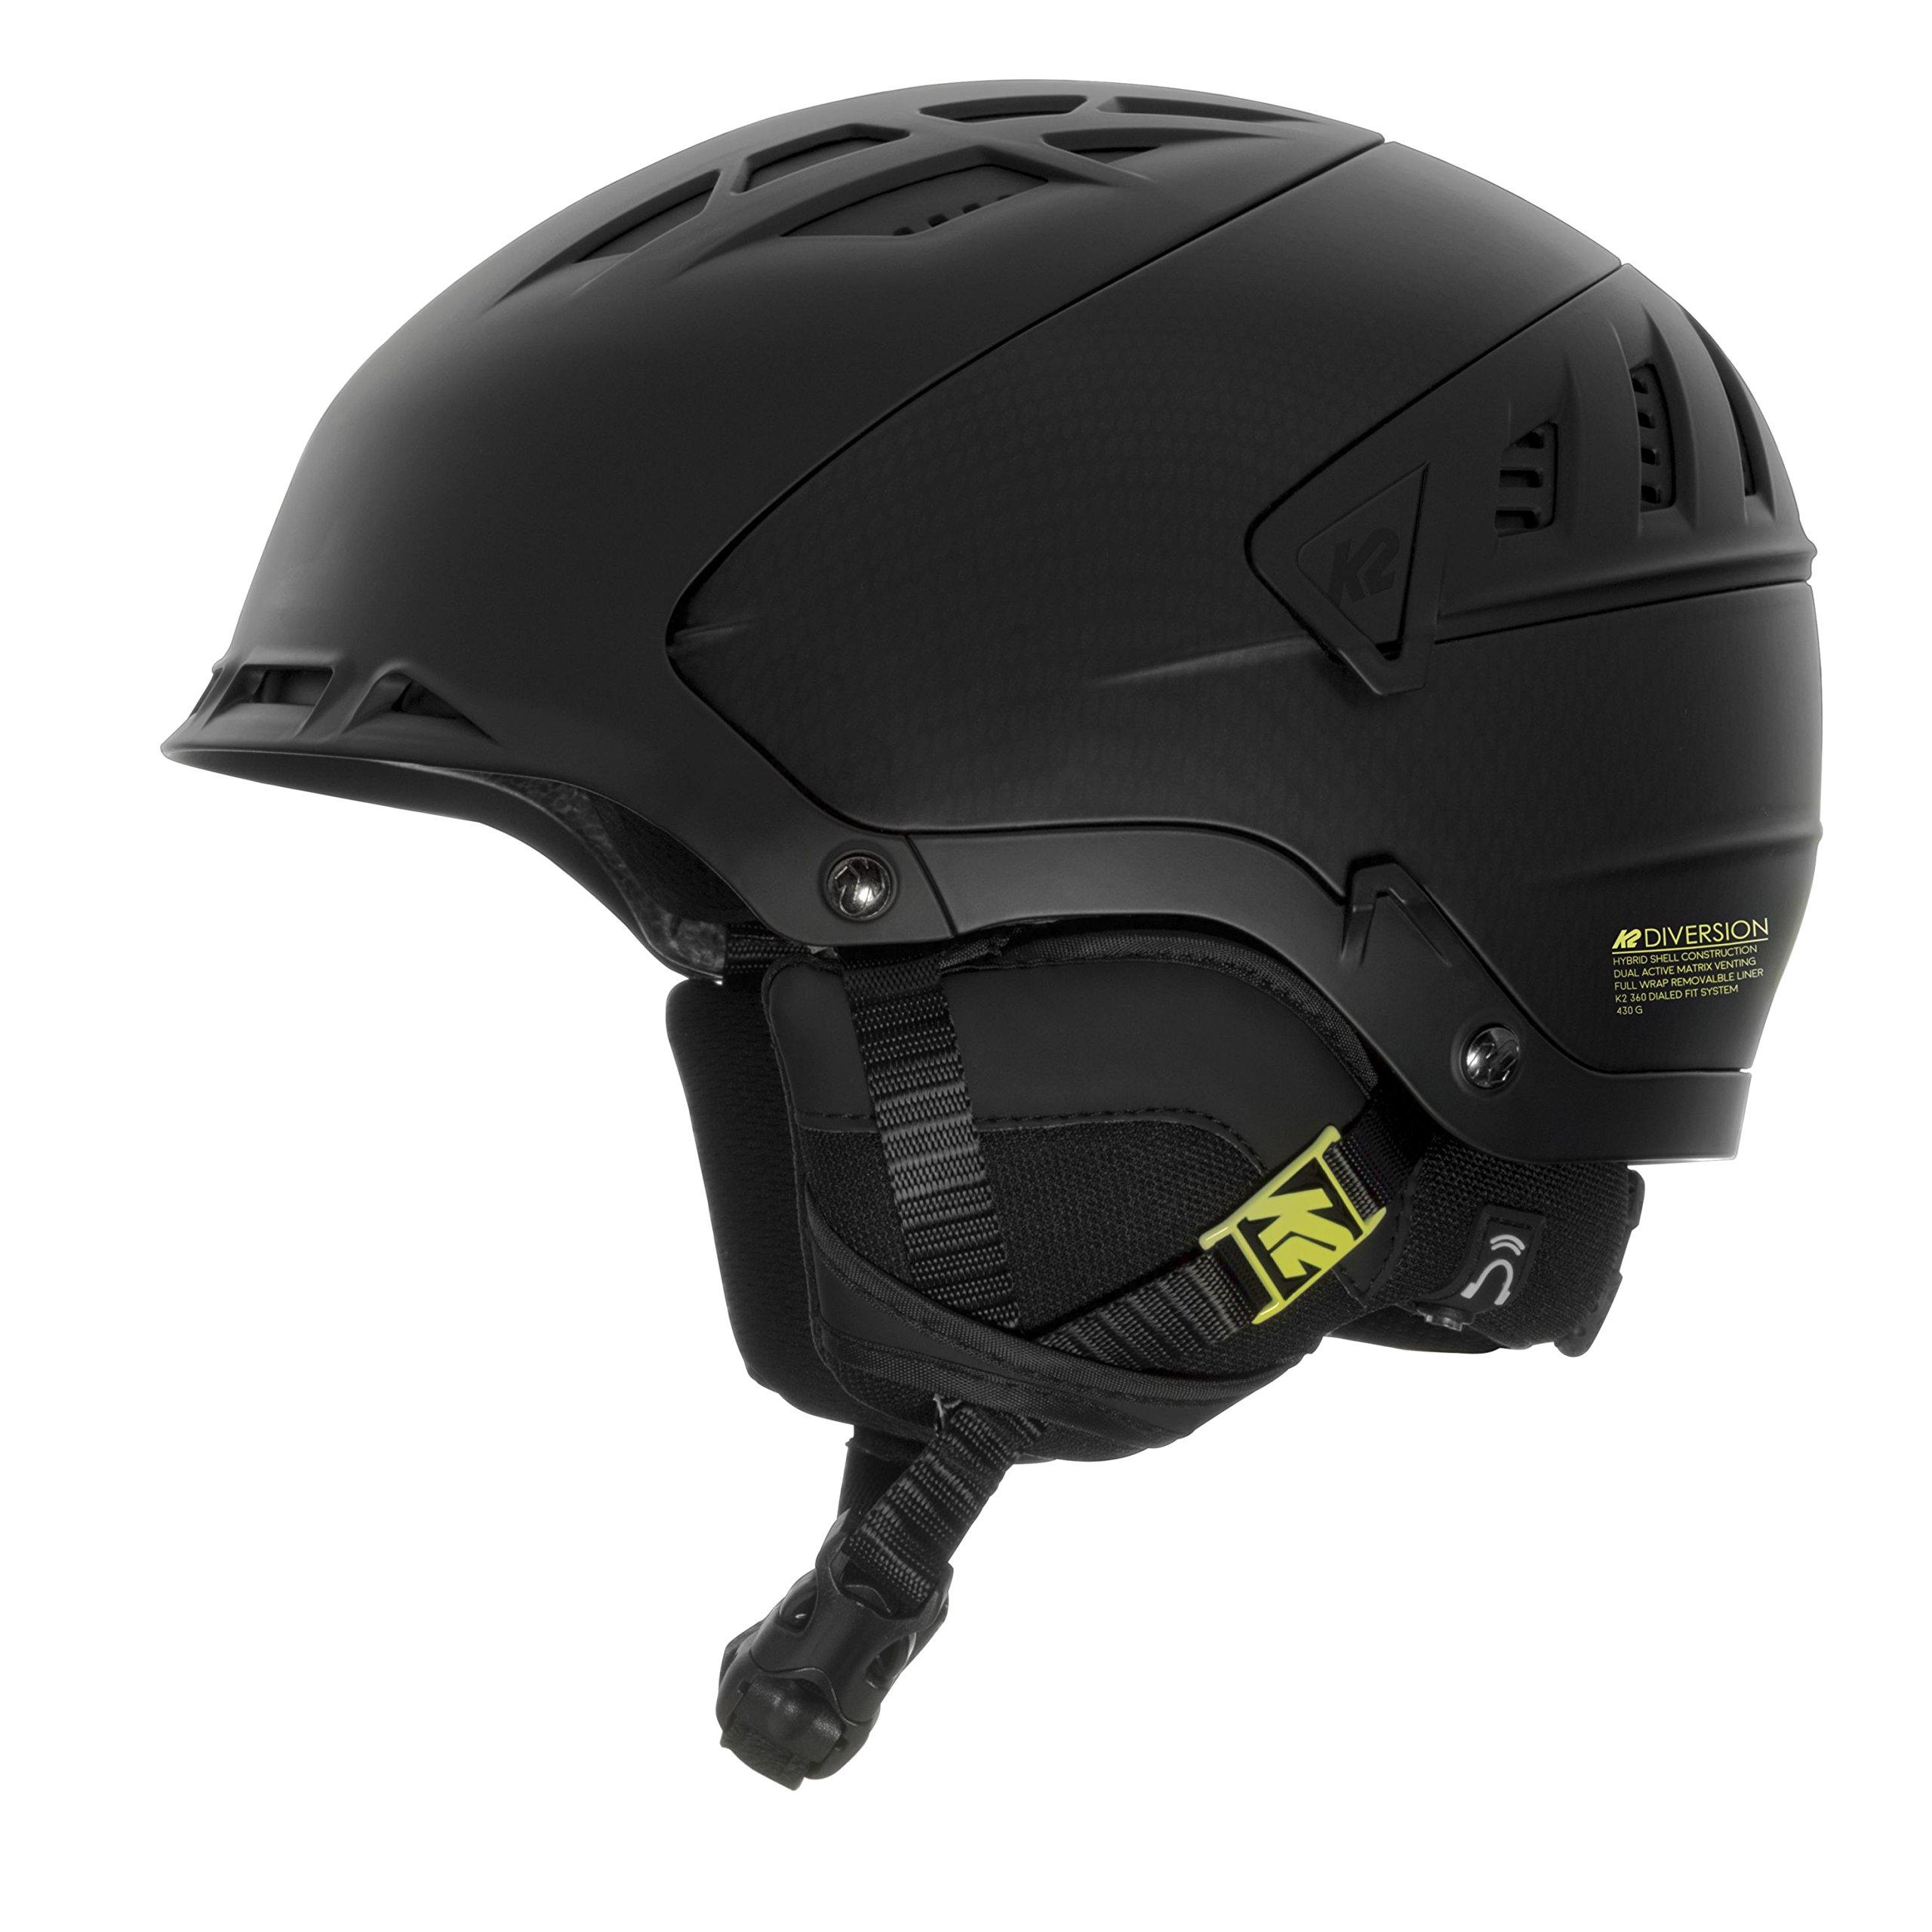 K2 Diversion Ski Helmet 2016